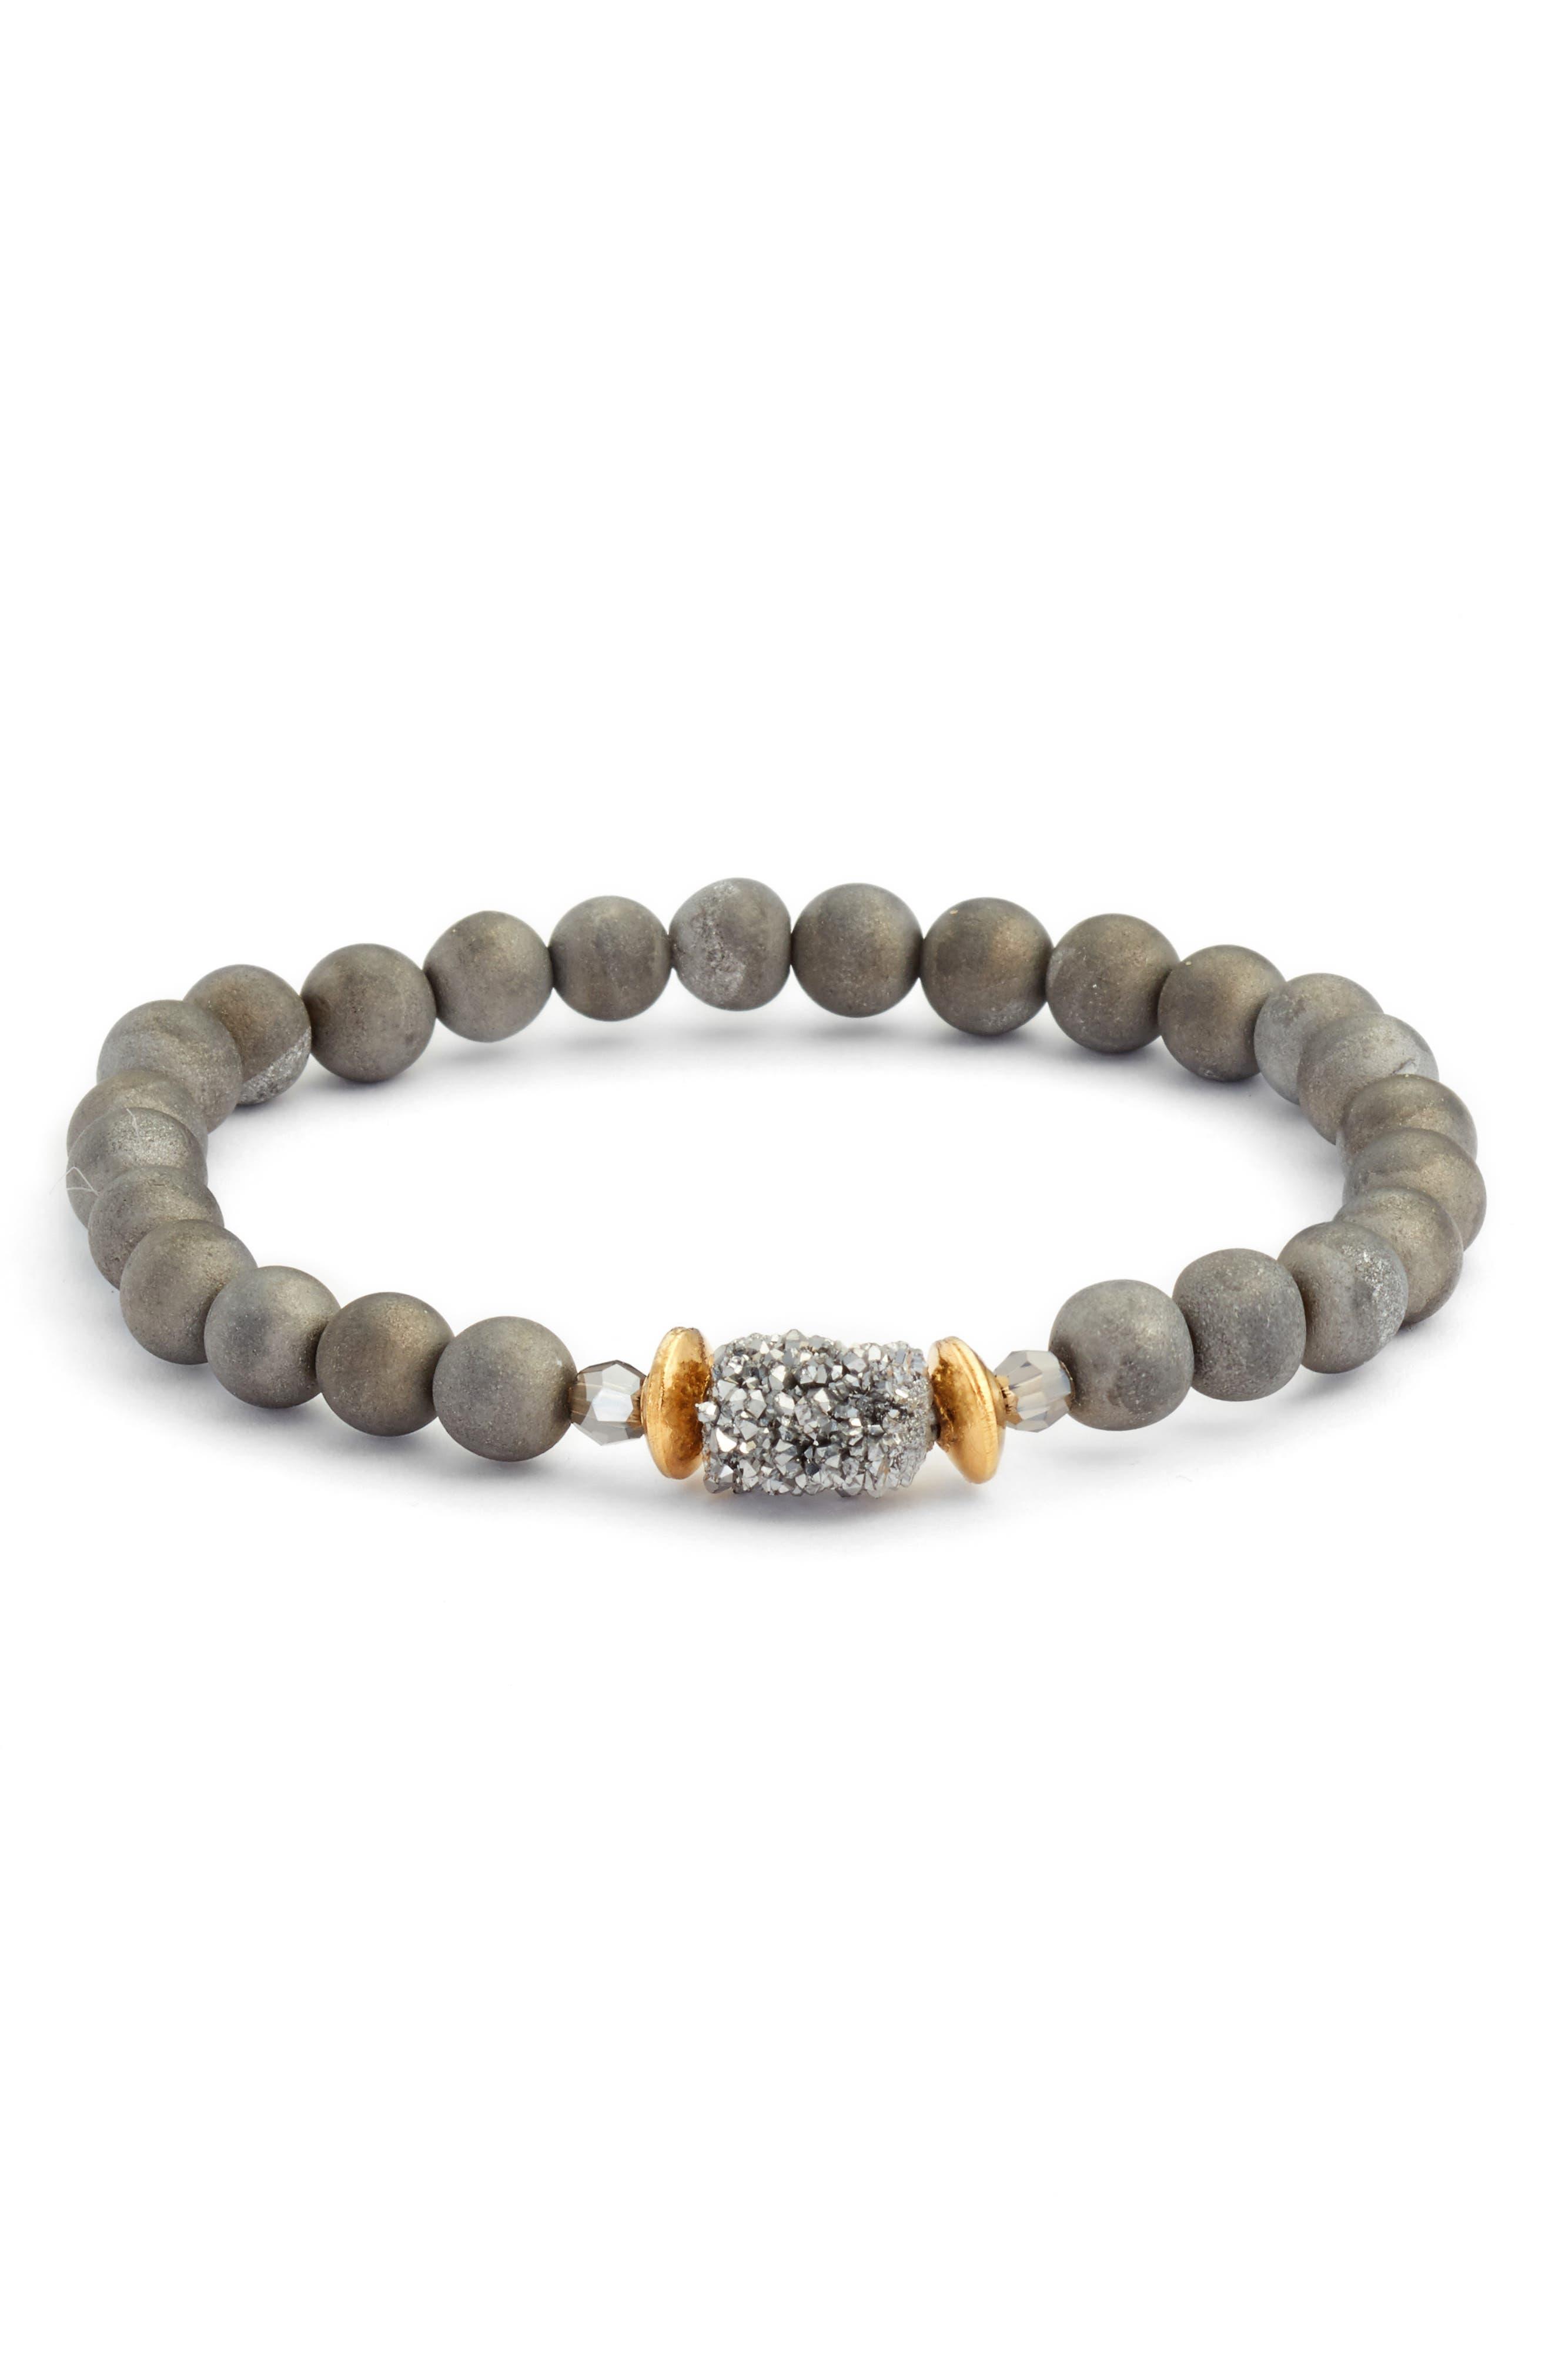 Agate Stretch Bracelet,                         Main,                         color, Silver Agate Mix